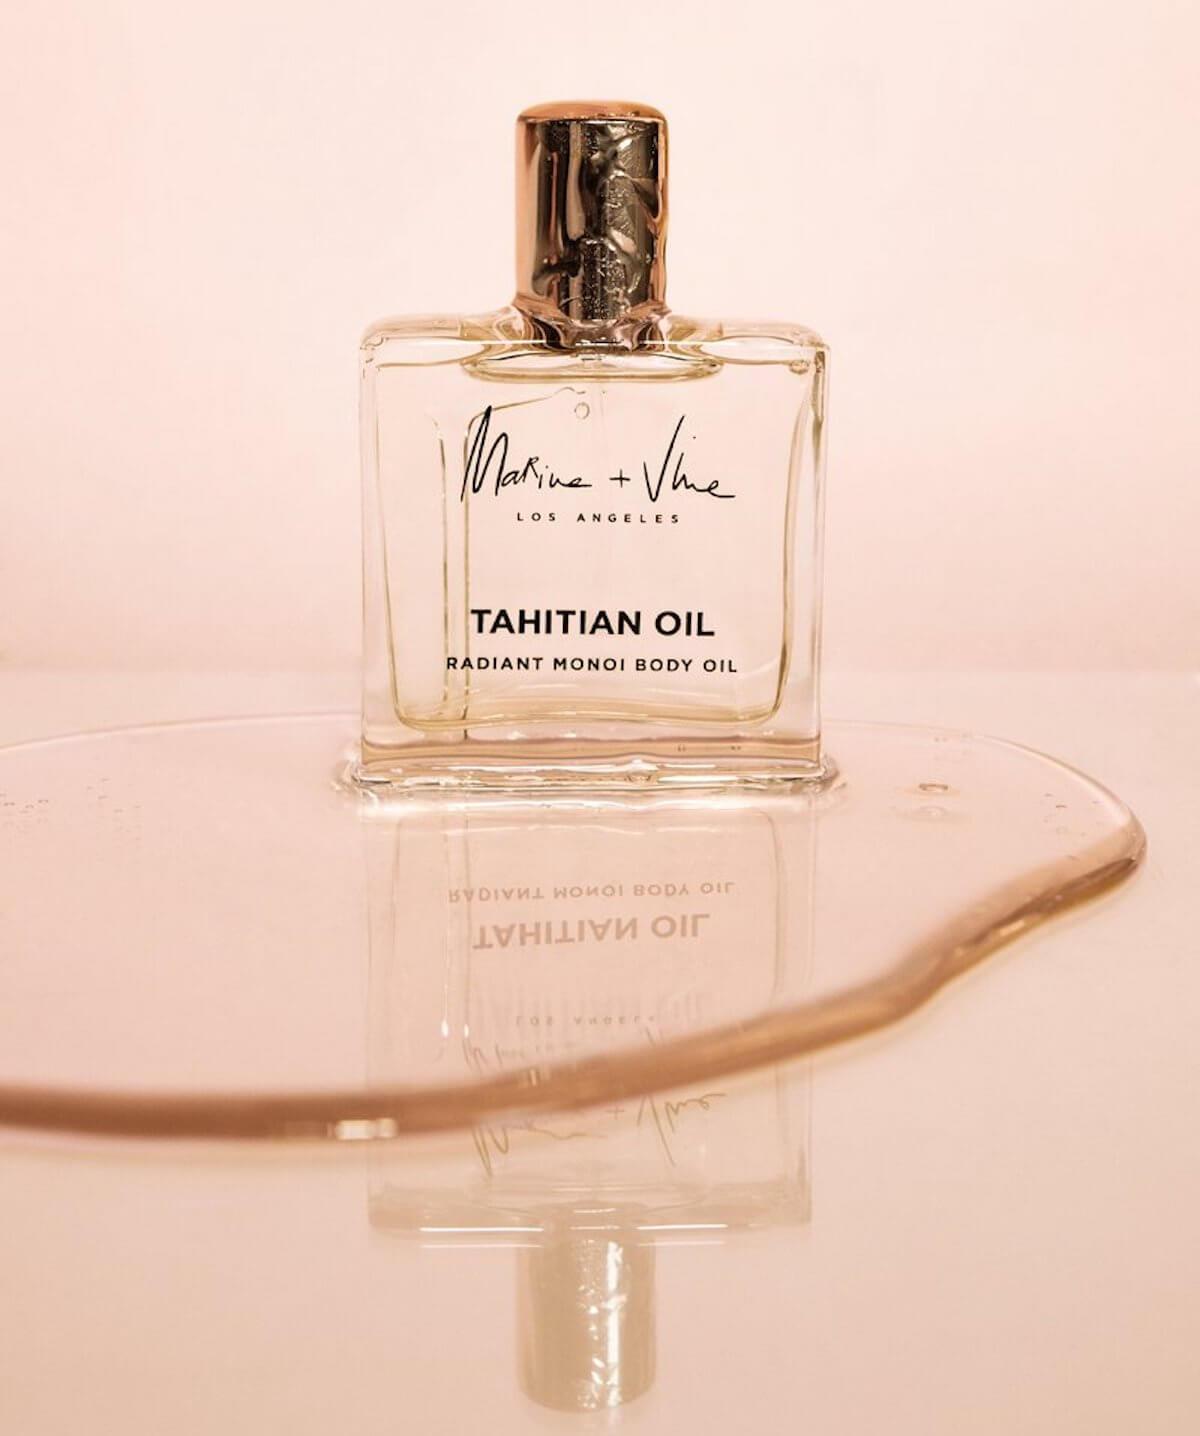 Marine + Vine tahitian body oil